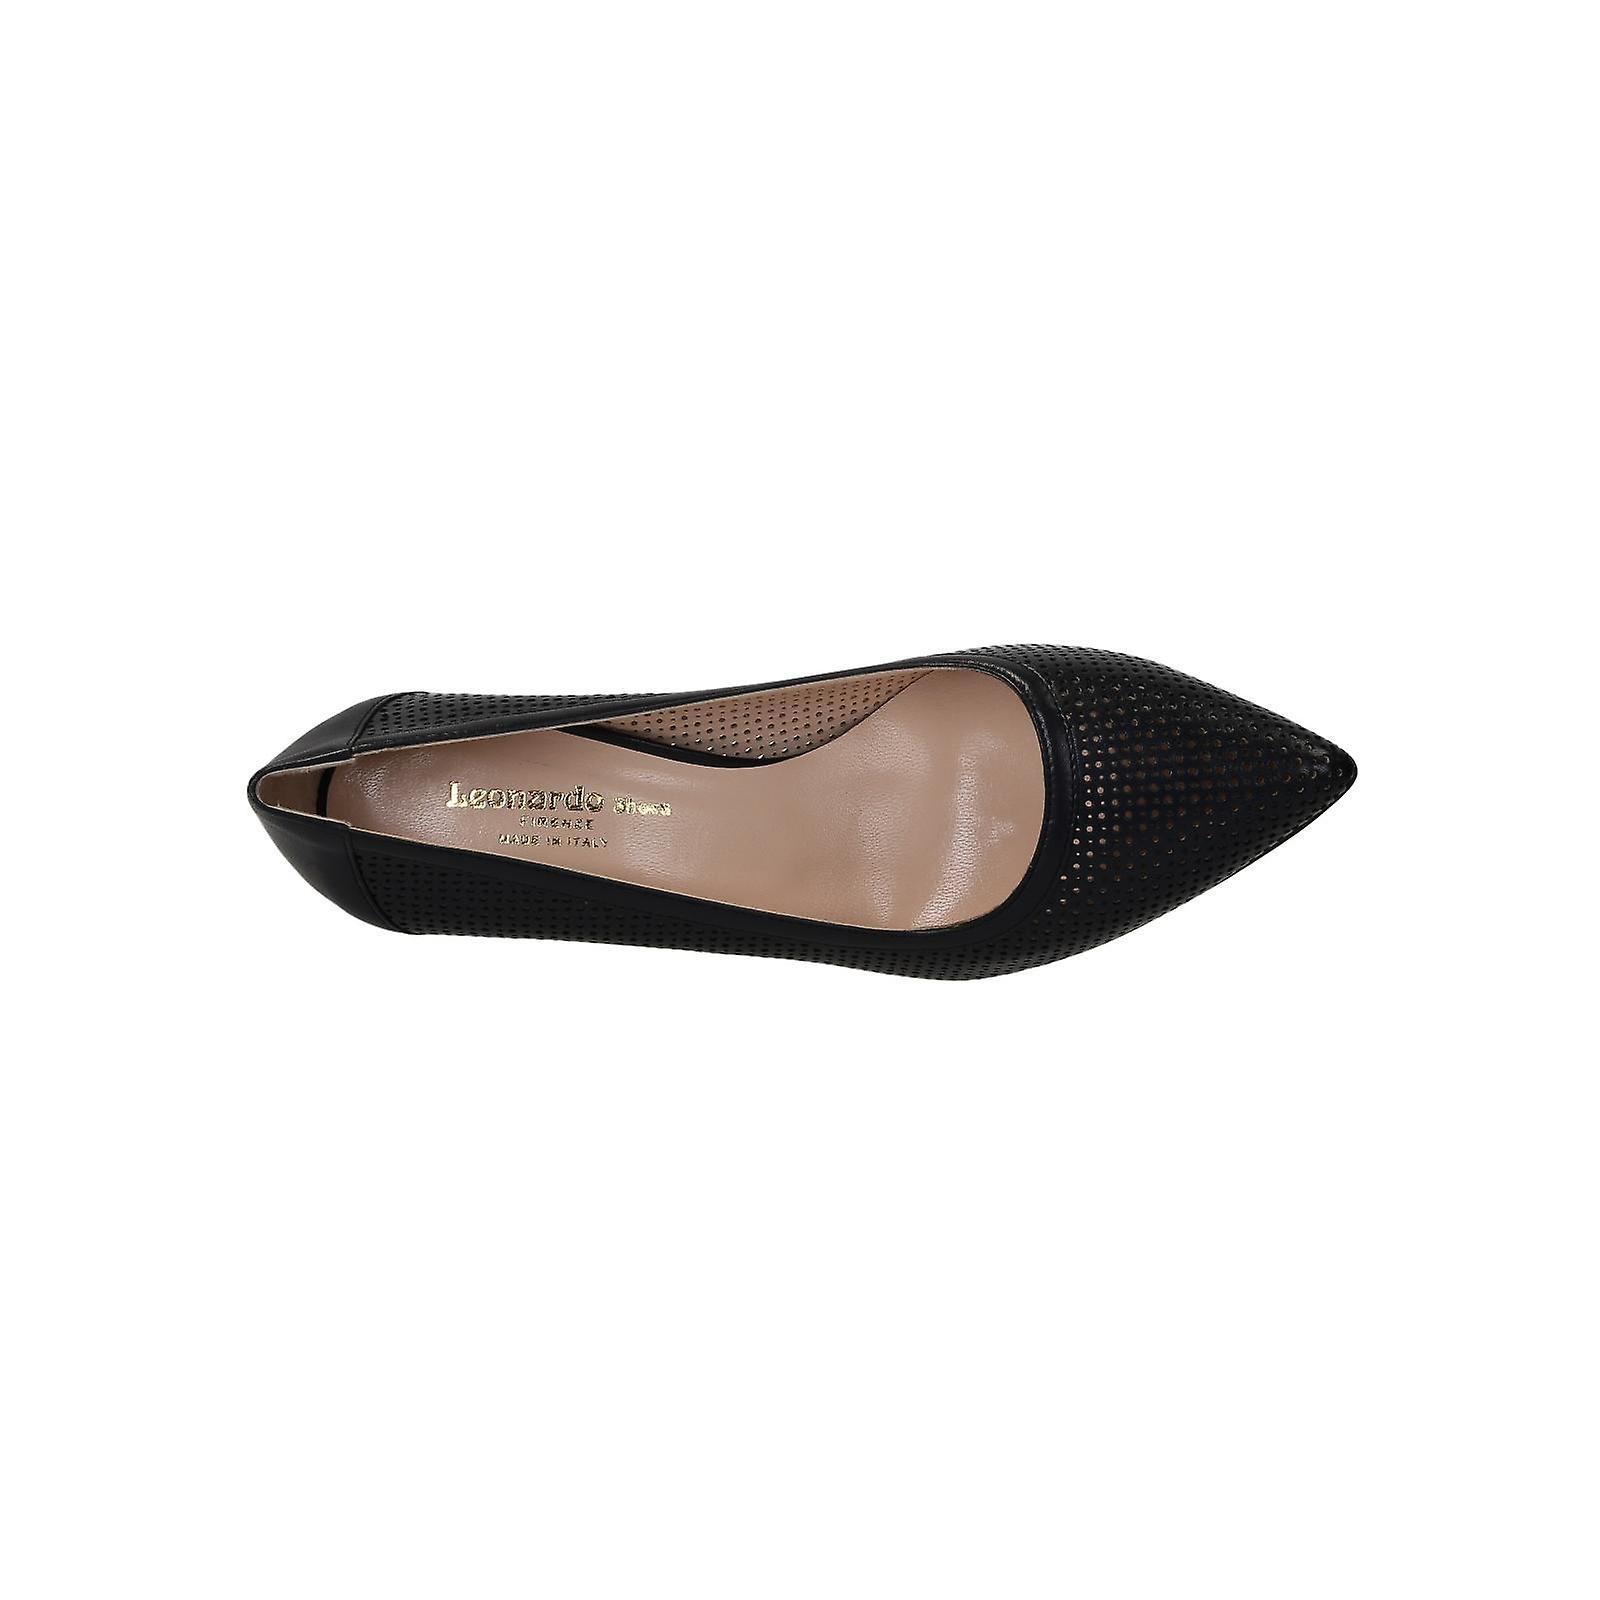 blue Dark calf stiletto pumps heels leather perforated with vwwxETqdr